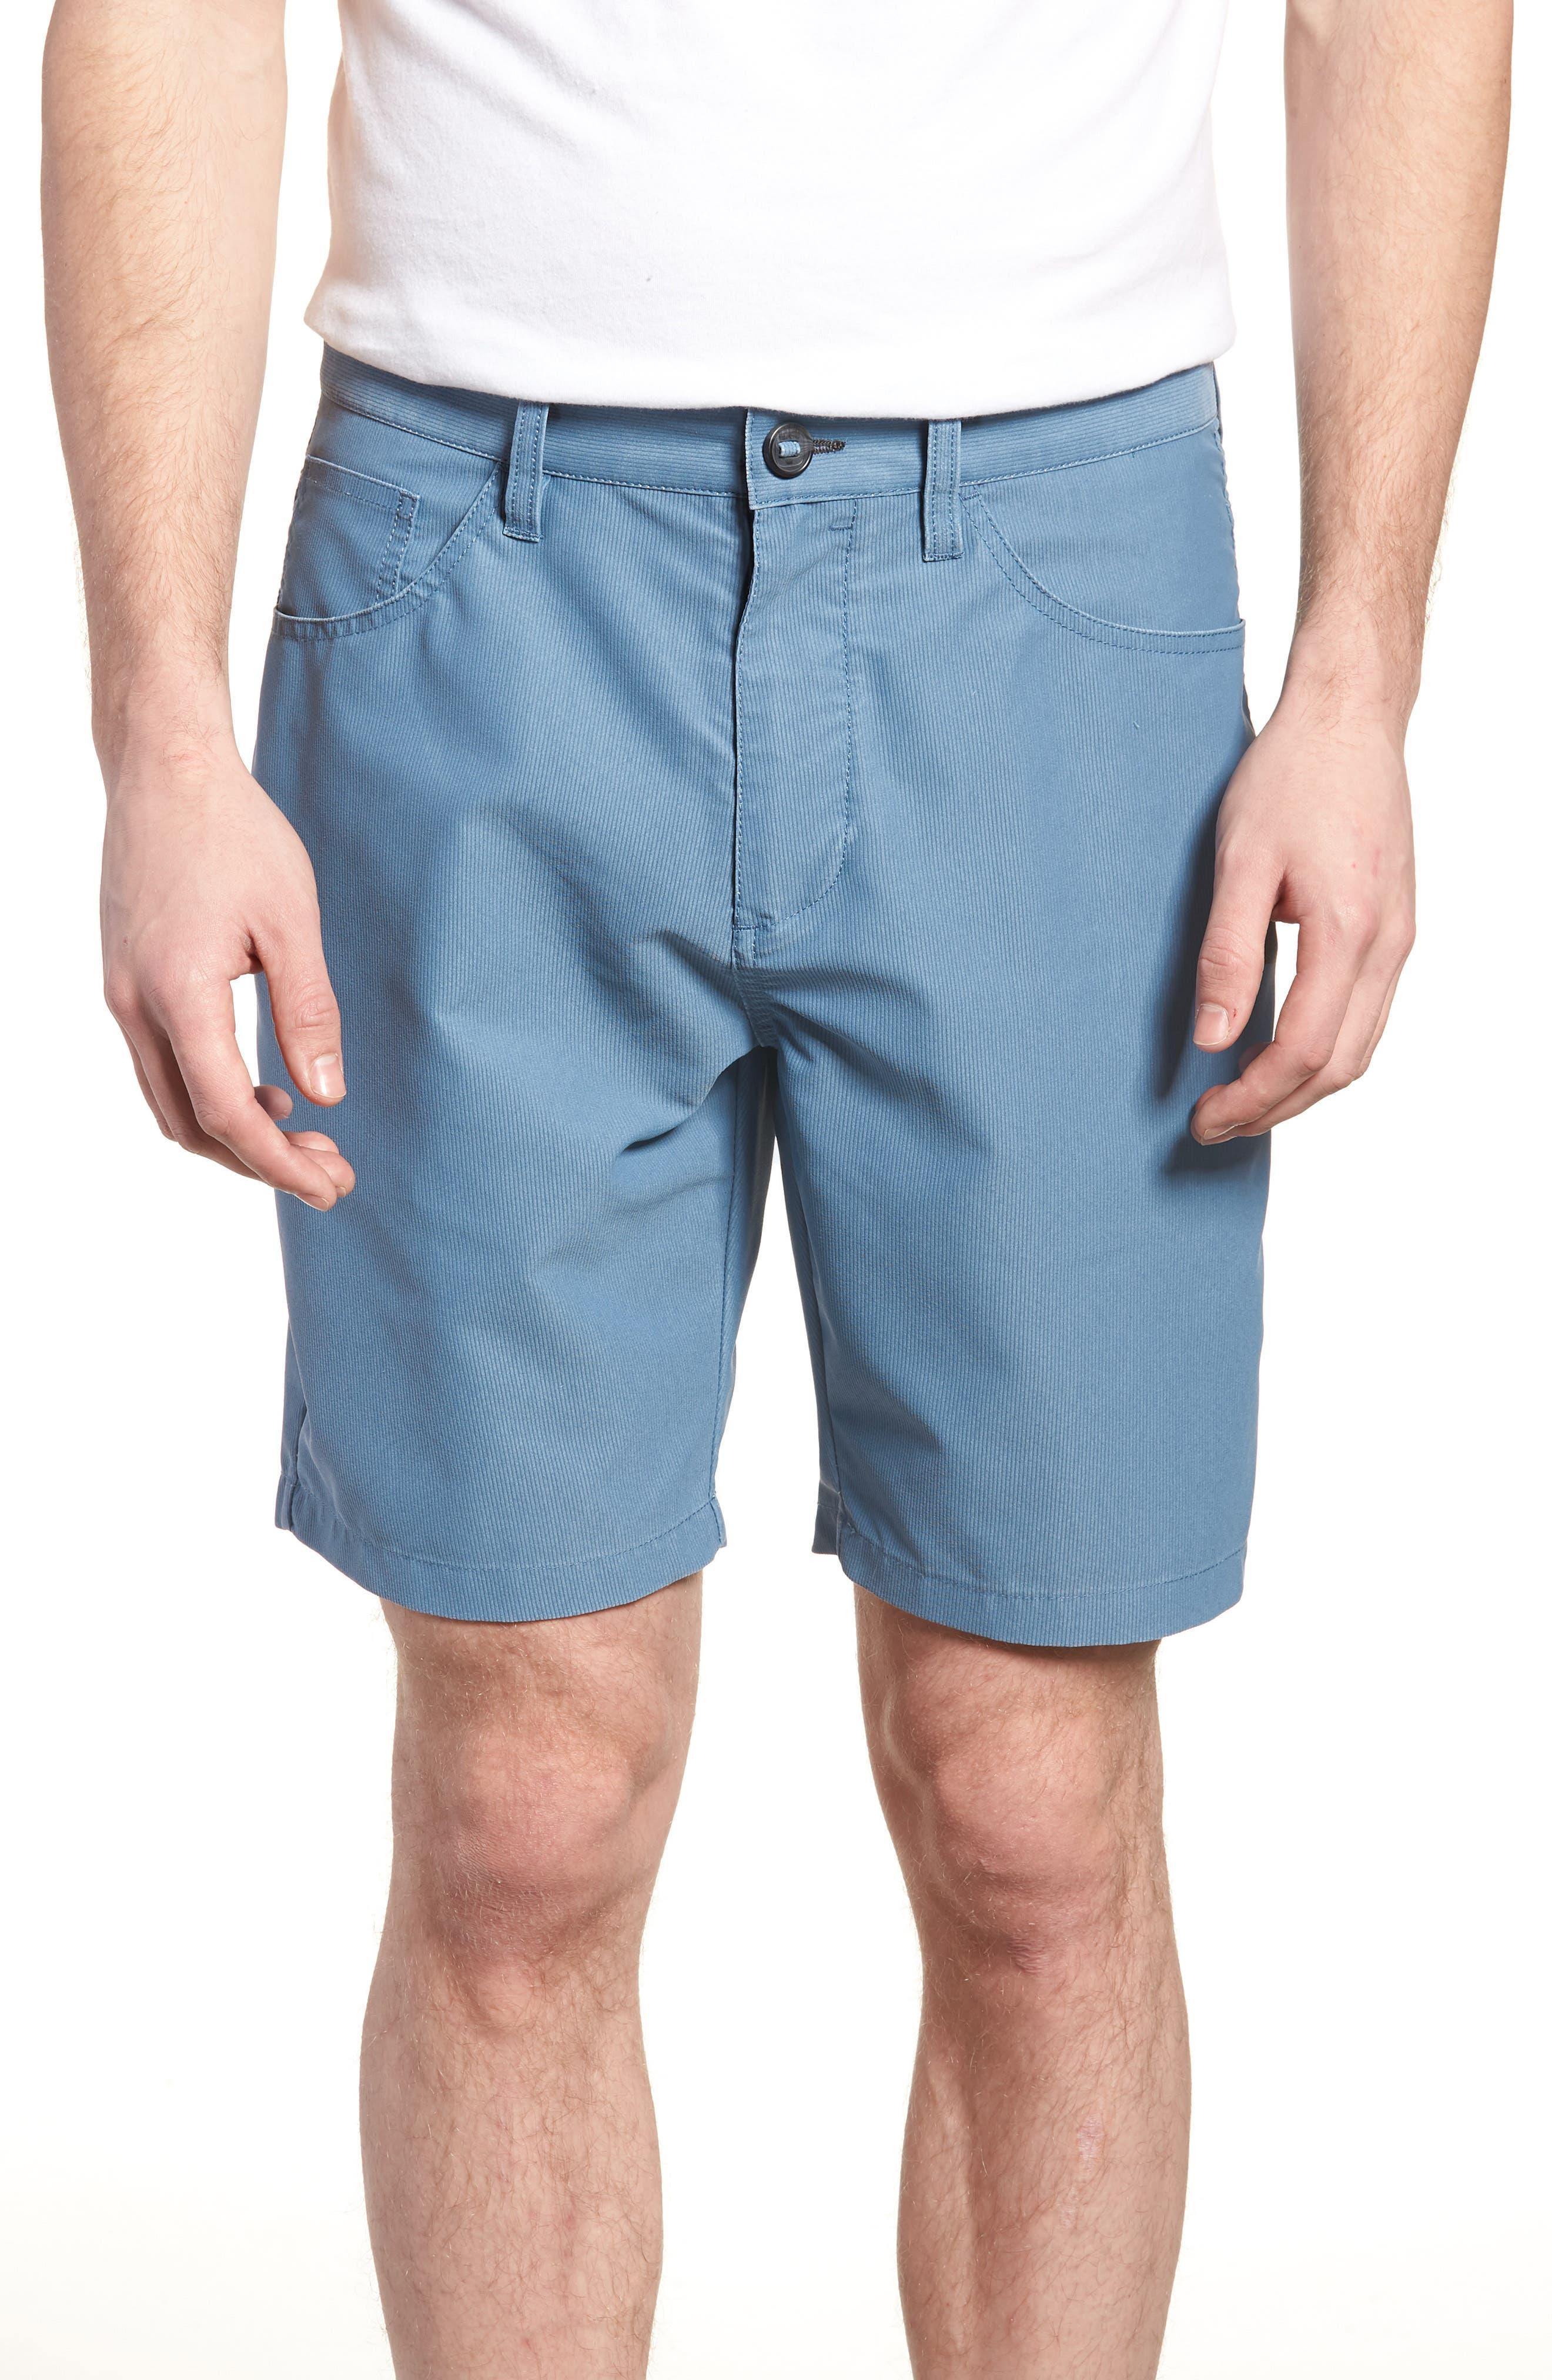 Outsider X Surf Corduroy Shorts,                         Main,                         color, Powder Blue